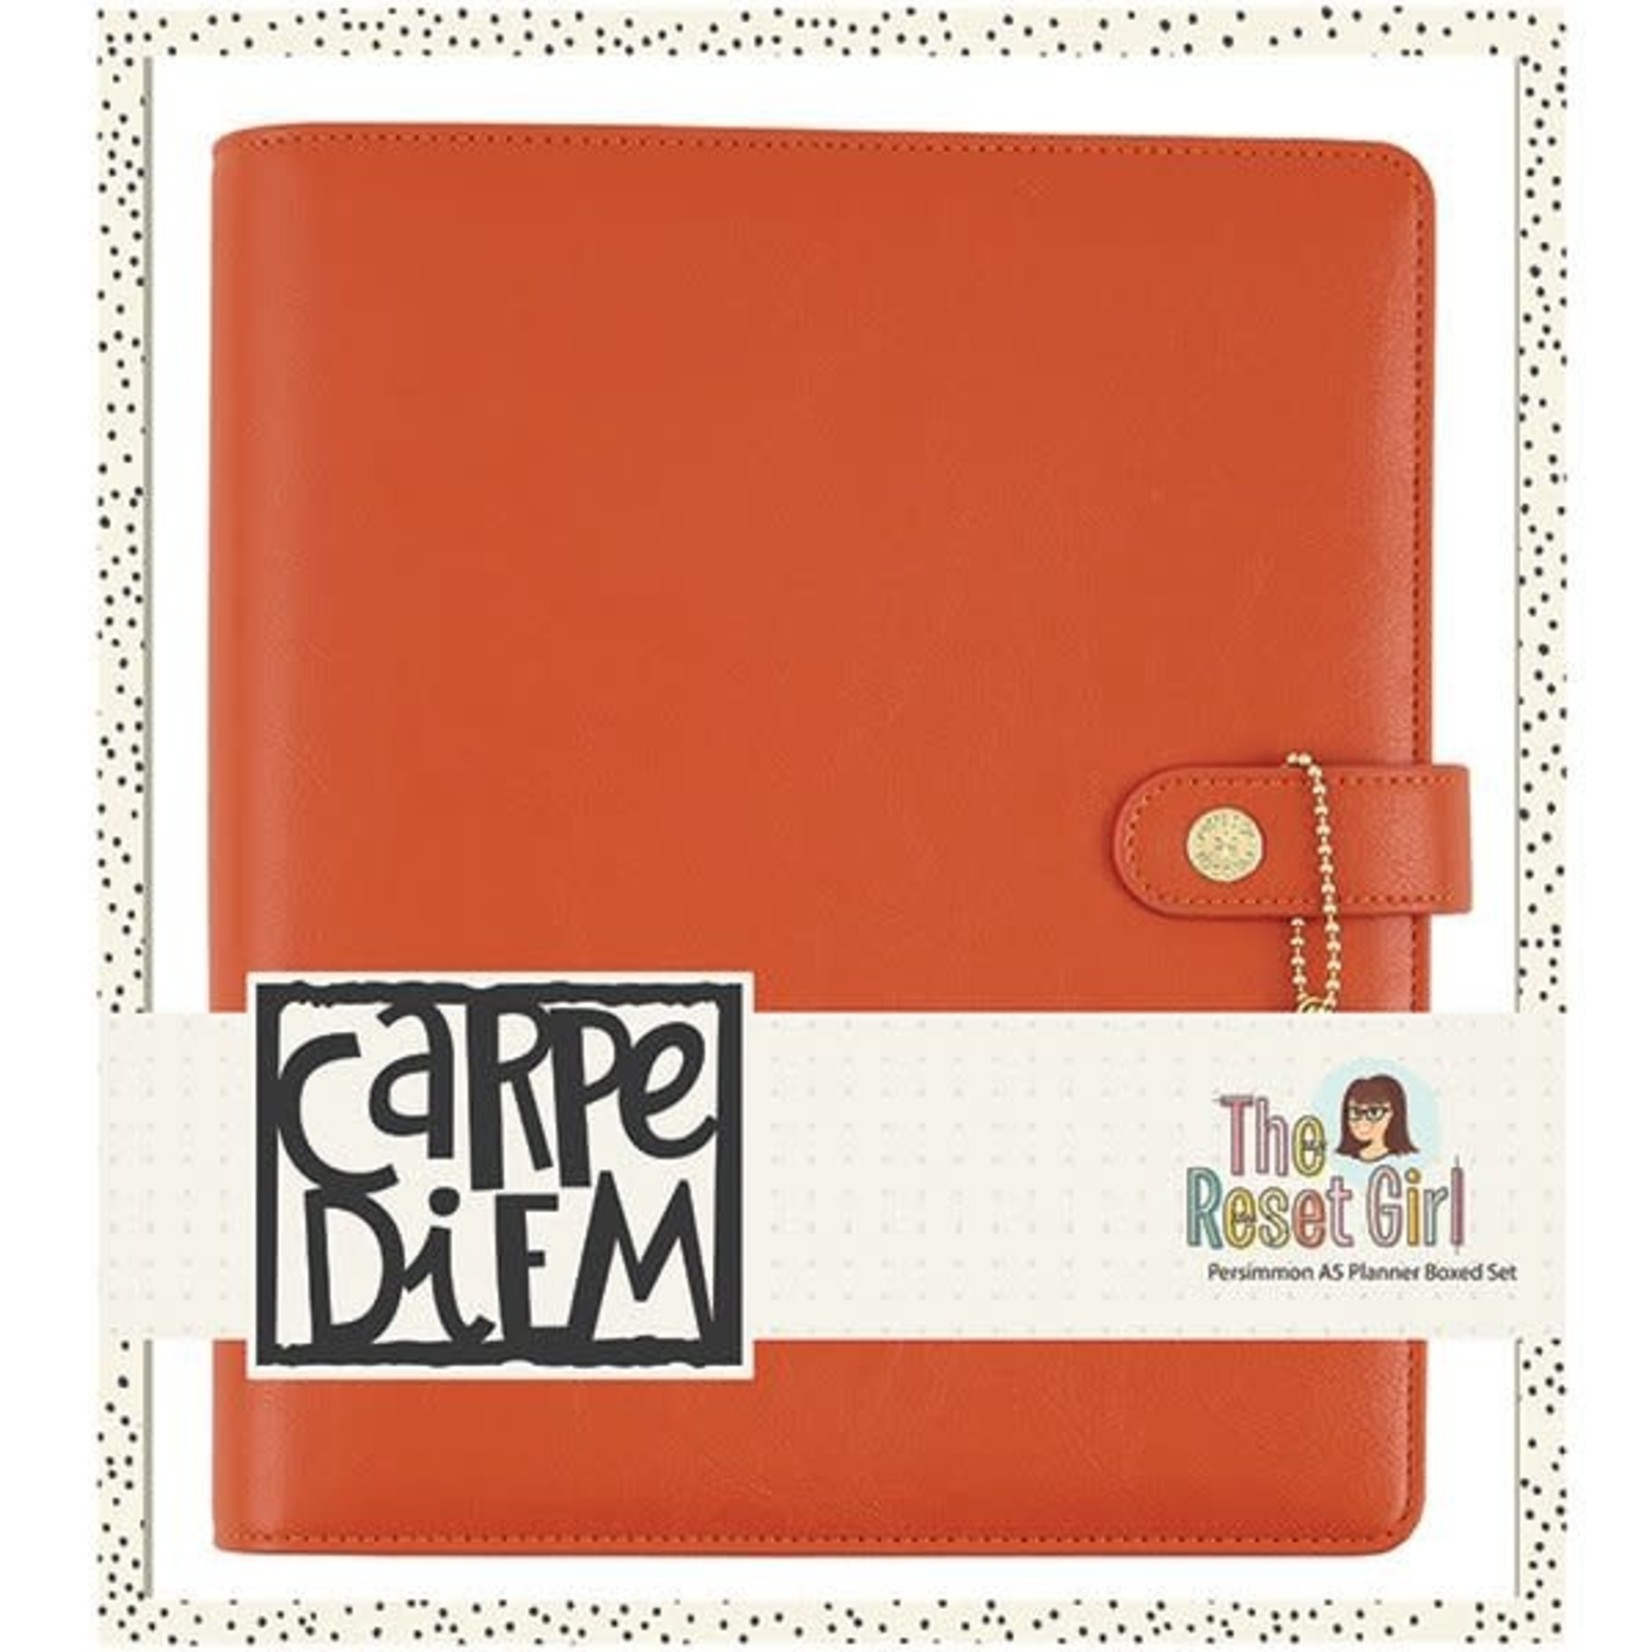 Carpe Diem Carpe Diem - The Reset Girl - Persimmon A5 Planner Box Set